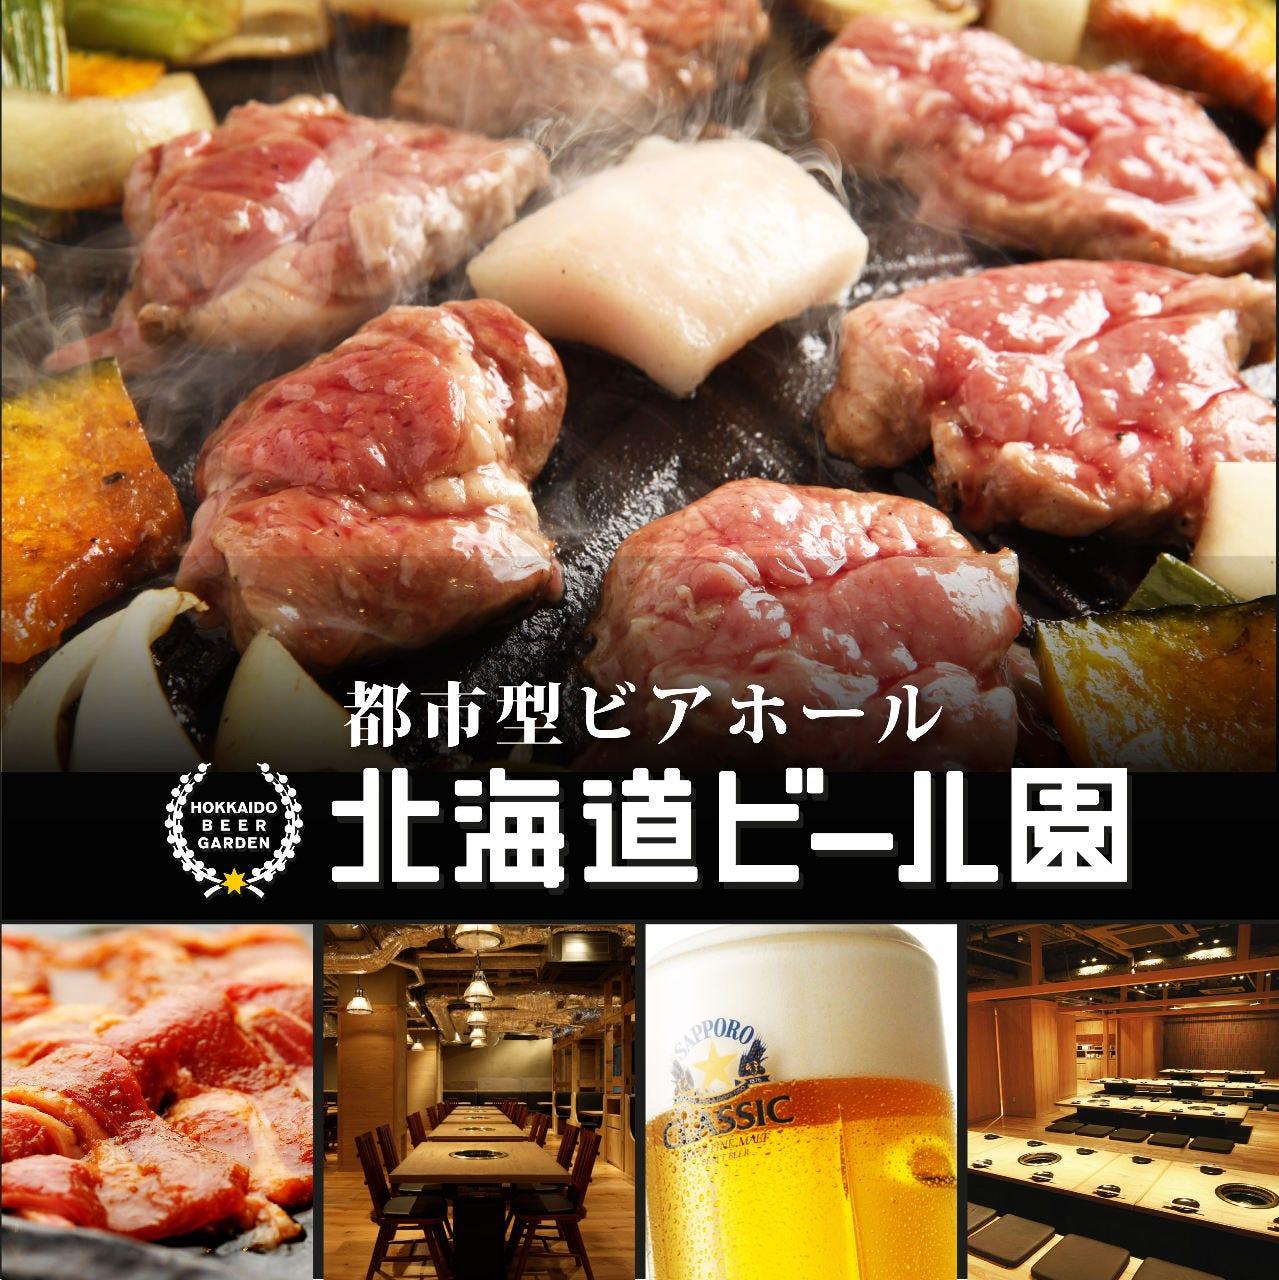 北海道ビール園